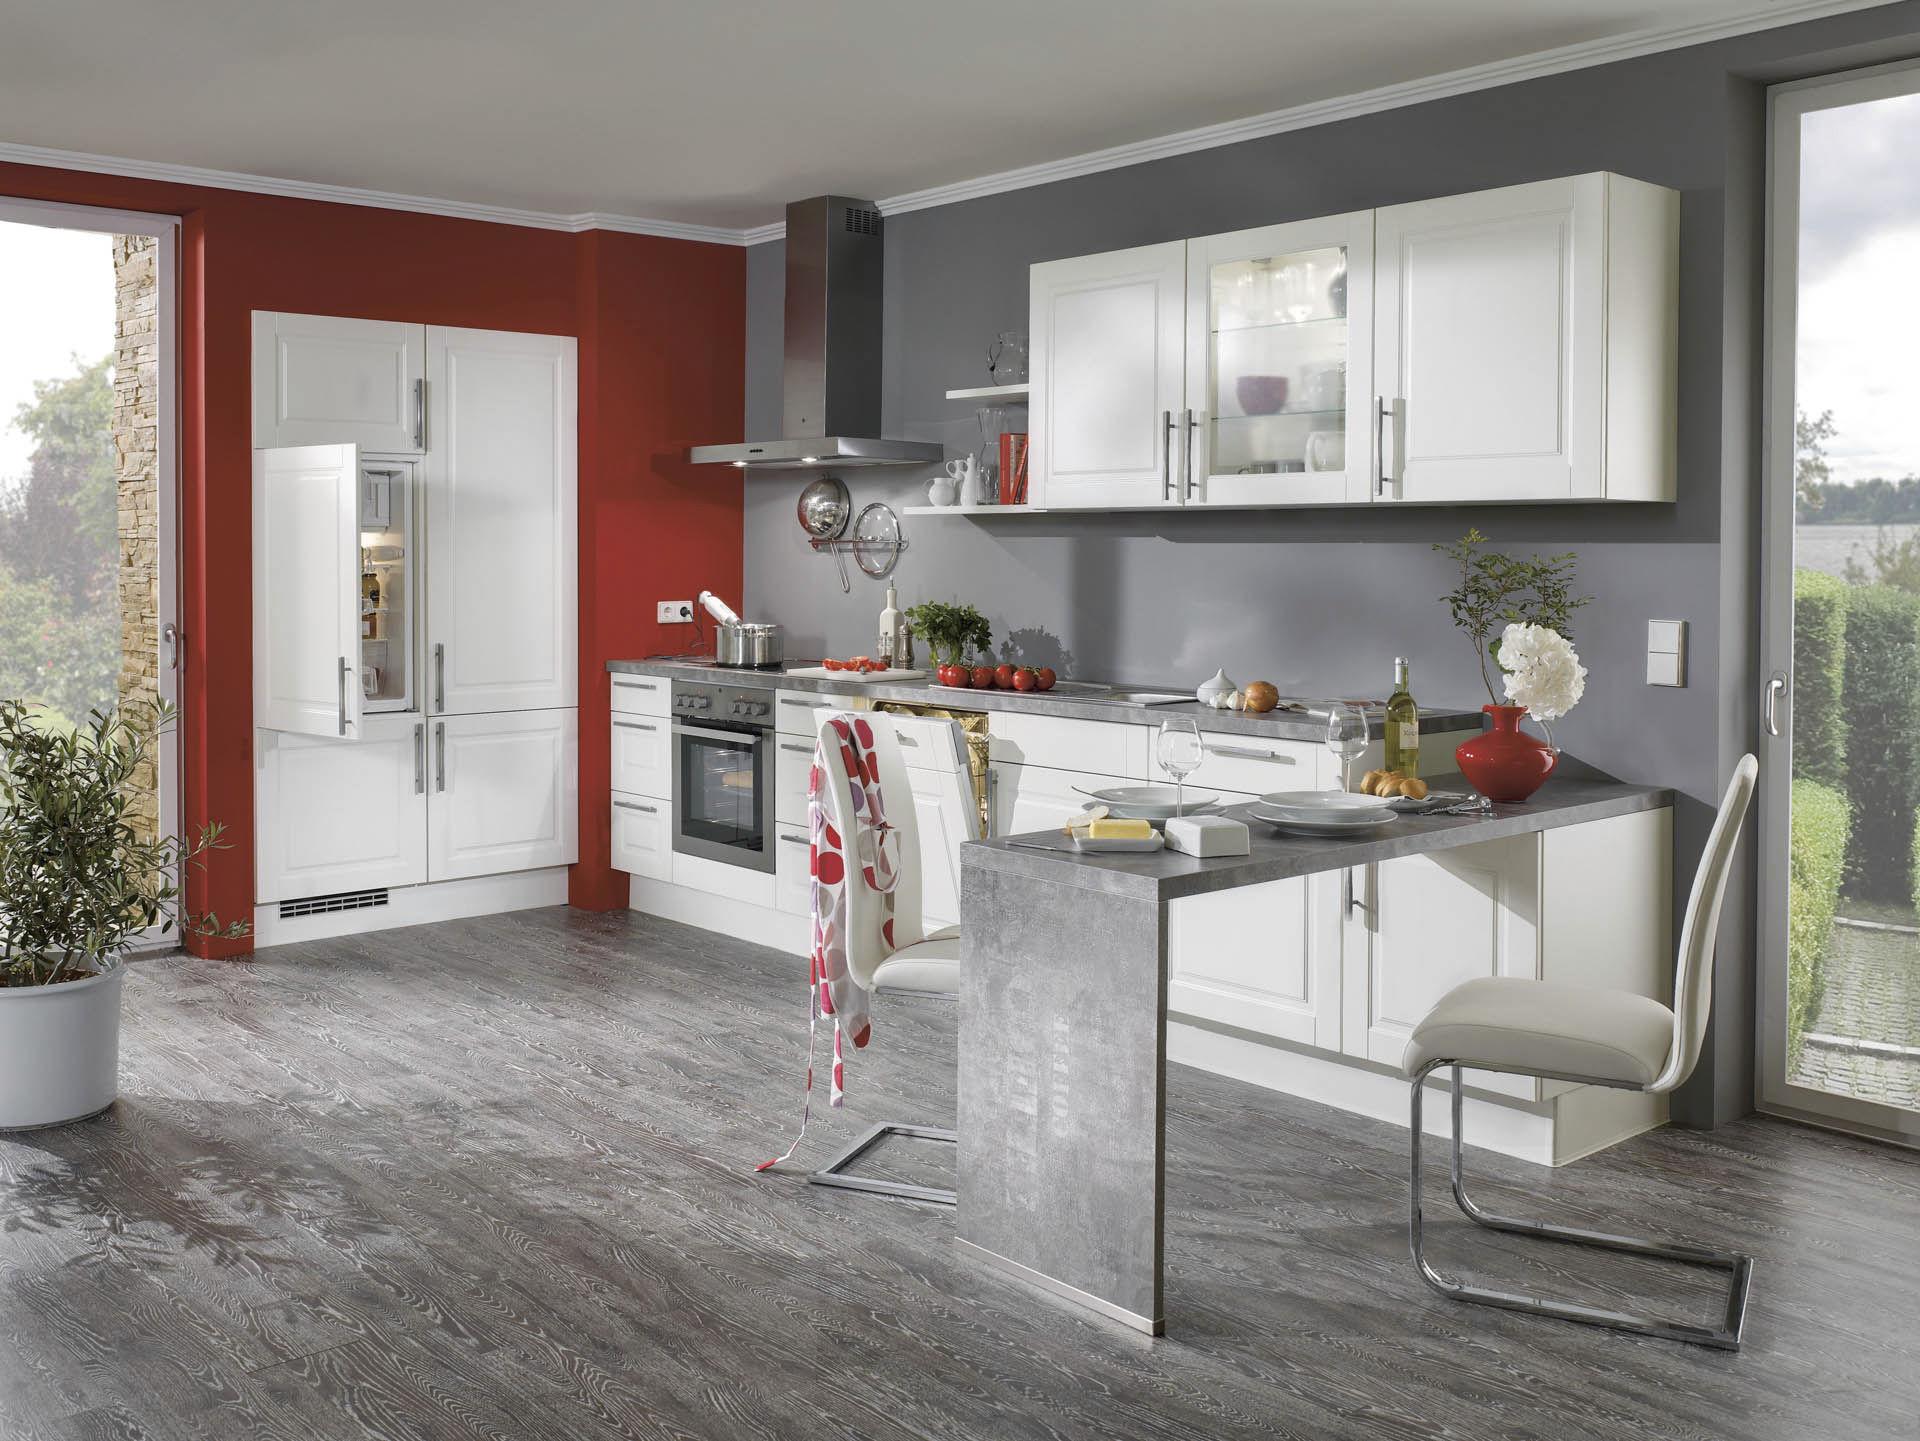 Moderne landhausküche nobilia  Moderne Küche / aus Marmor / lackiert - AVIANO 471 - nobilia